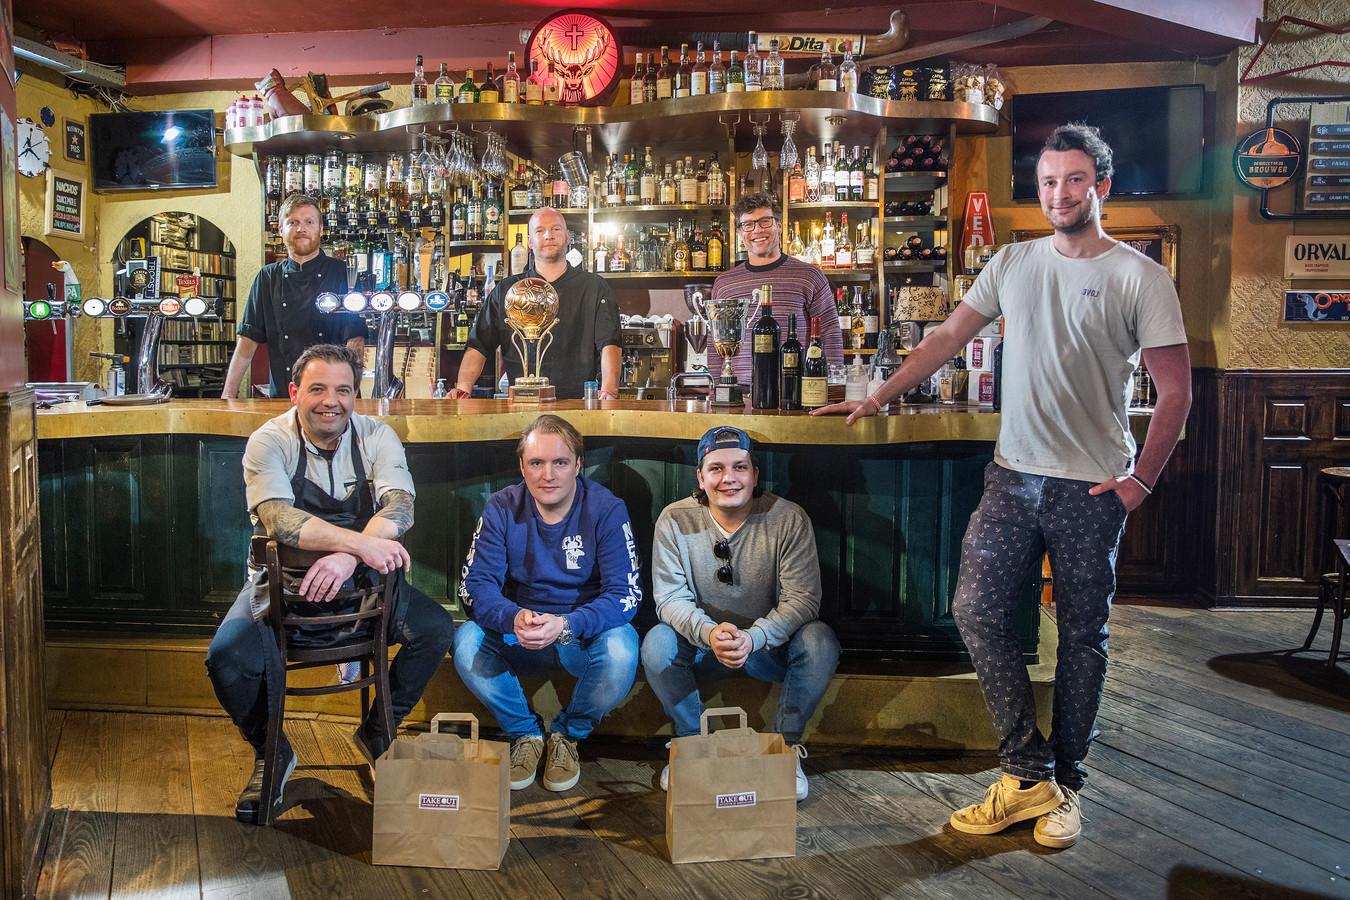 De kameraden van sportcafe Not Out. Achter de bar v.l.n.r. Marvin, Robin, Jeroen. Voor de bar v.l.n.r. Mark, Colin, Tim en Job.